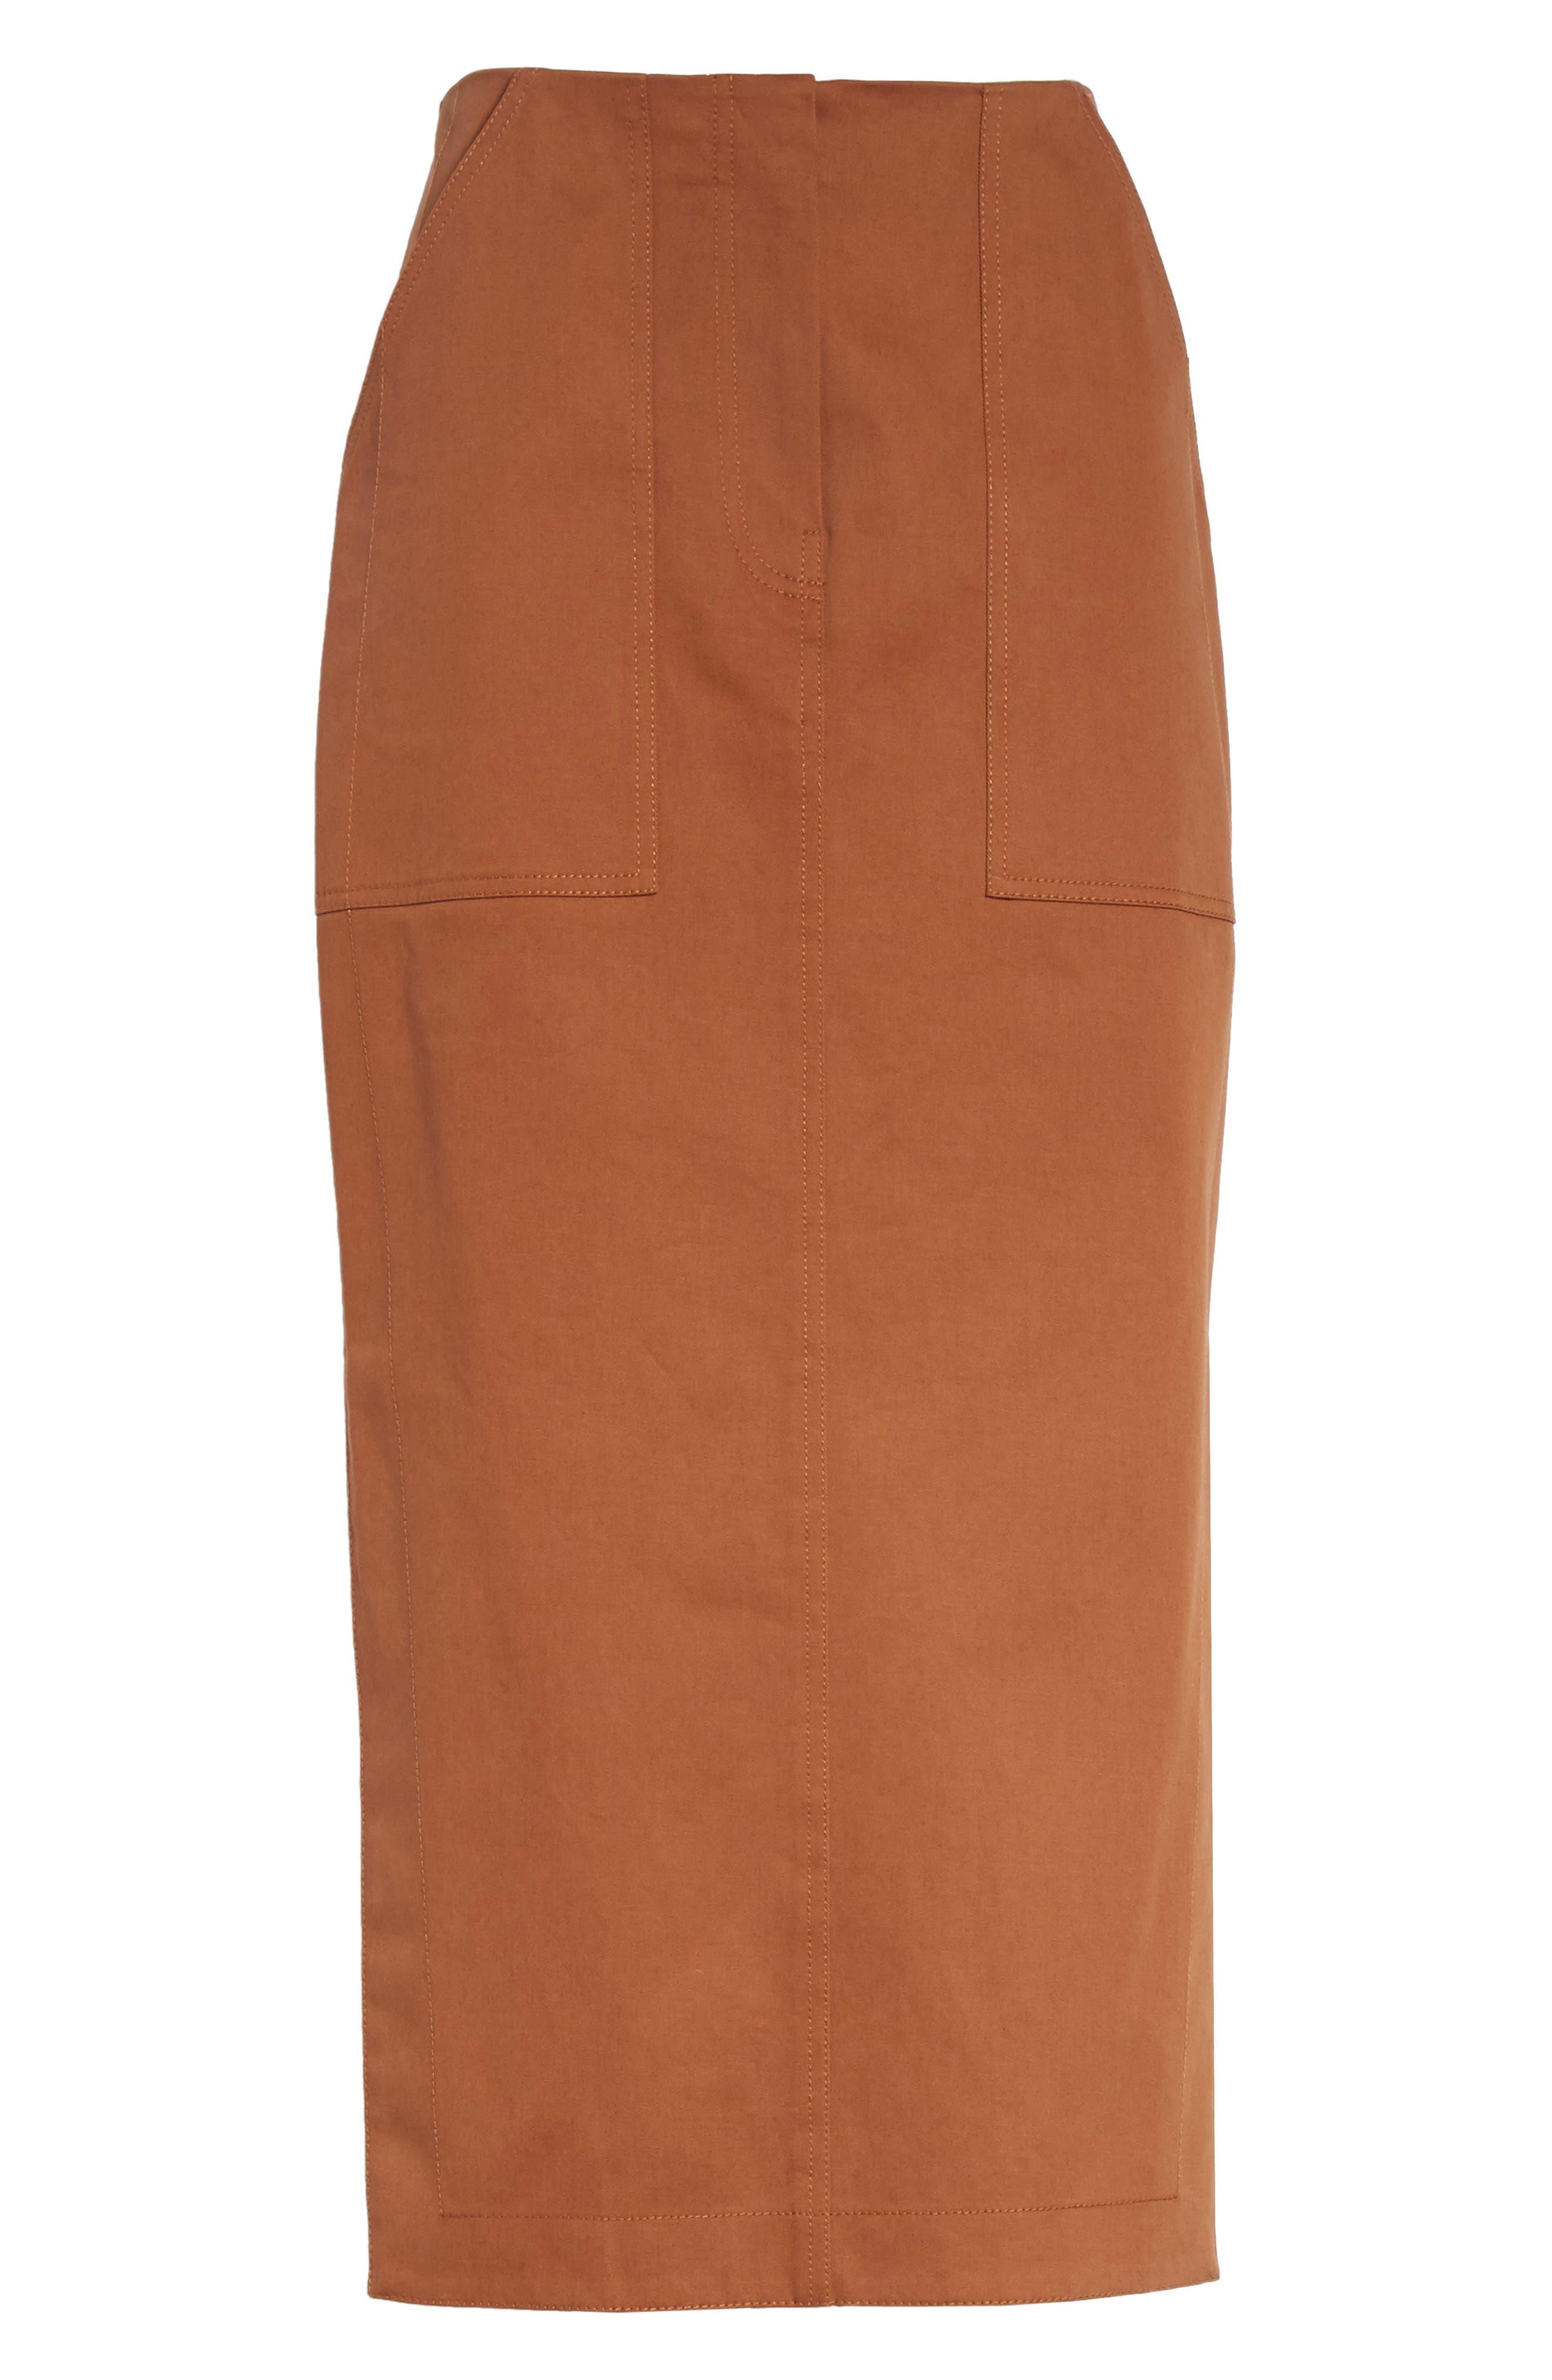 Diane von Furstenberg Midi Twill Pencil Skirt,                             Alternate thumbnail 6, color,                             203